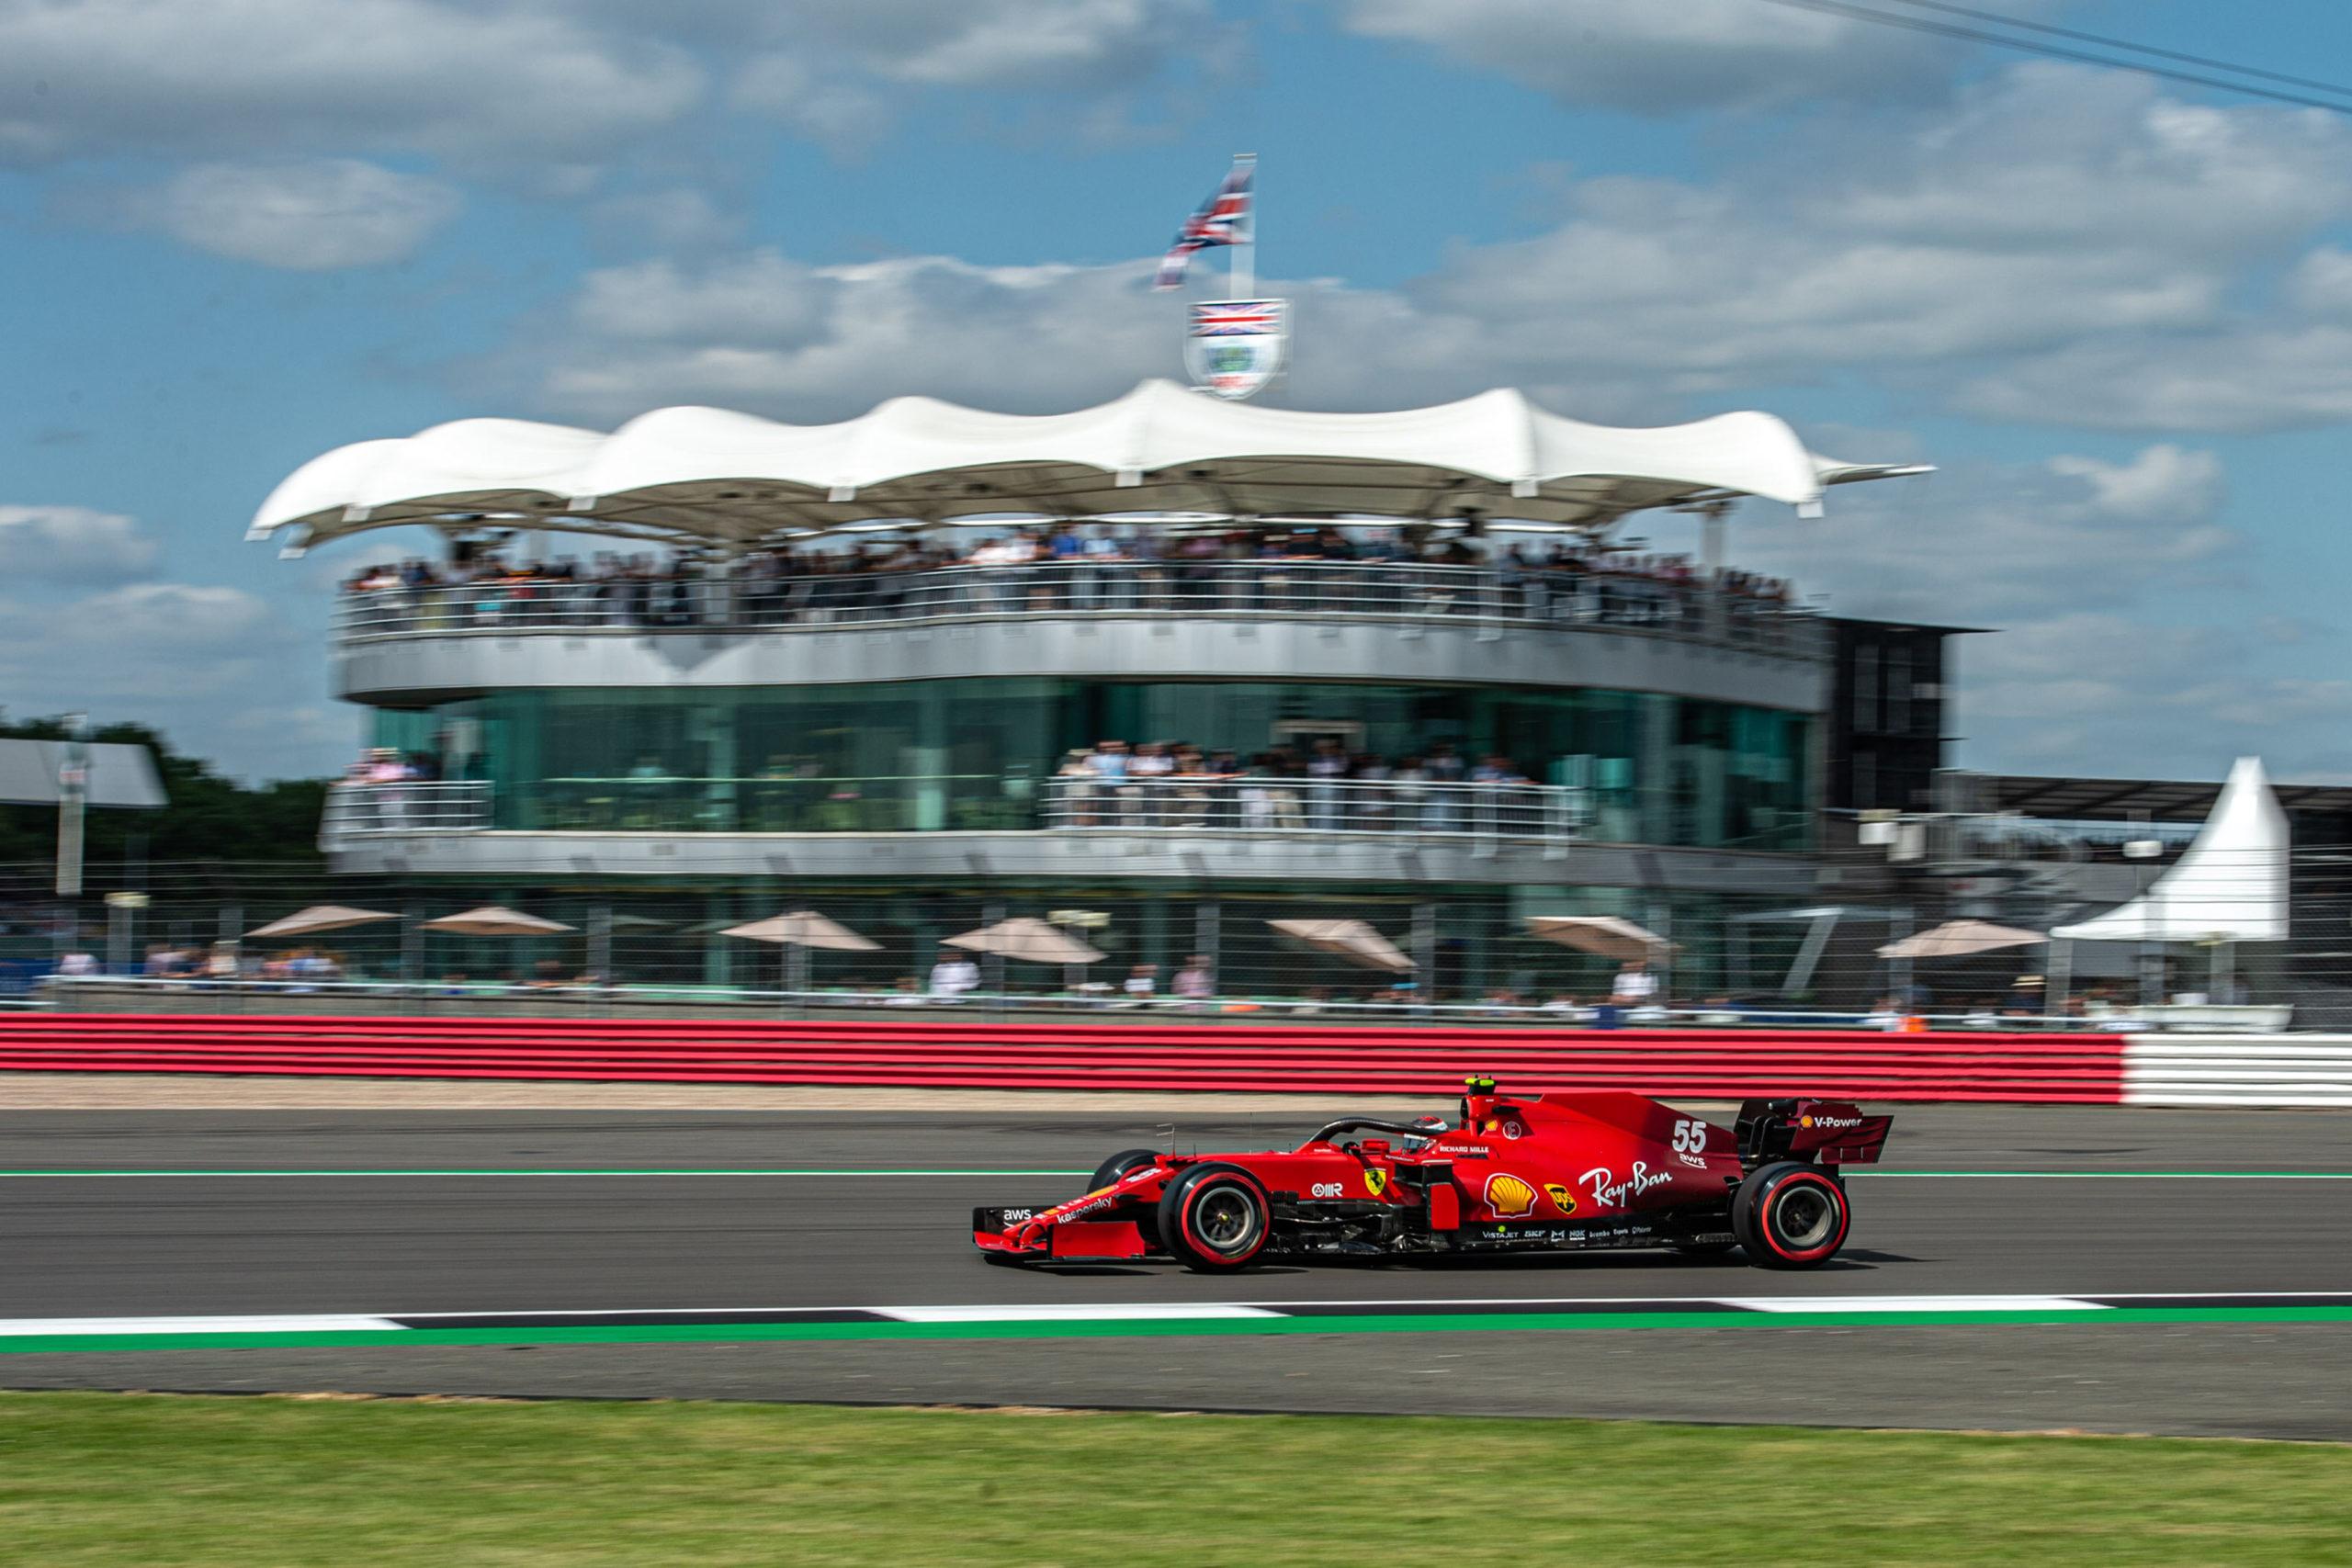 Carlos Sainz, Ferrari, GP GRAN BRETAGNA F1/2021 - VENERDÌ 16/07/2021   credit: @Scuderia Ferrari Press Office